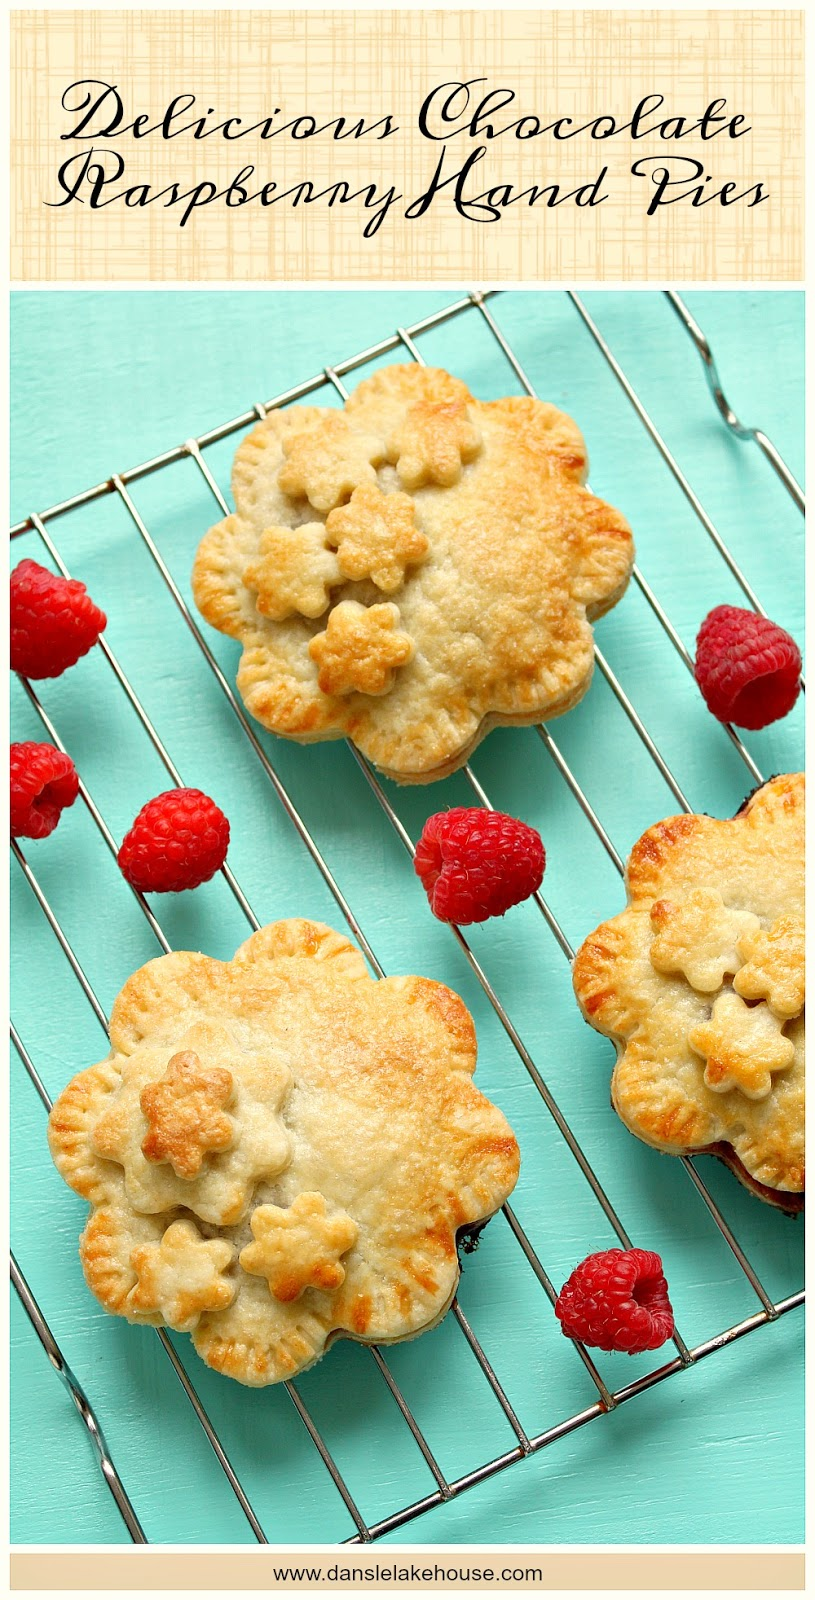 Chocolate Raspberry Hand Pie - So easy, so delicious | www.danslelakehouse.com